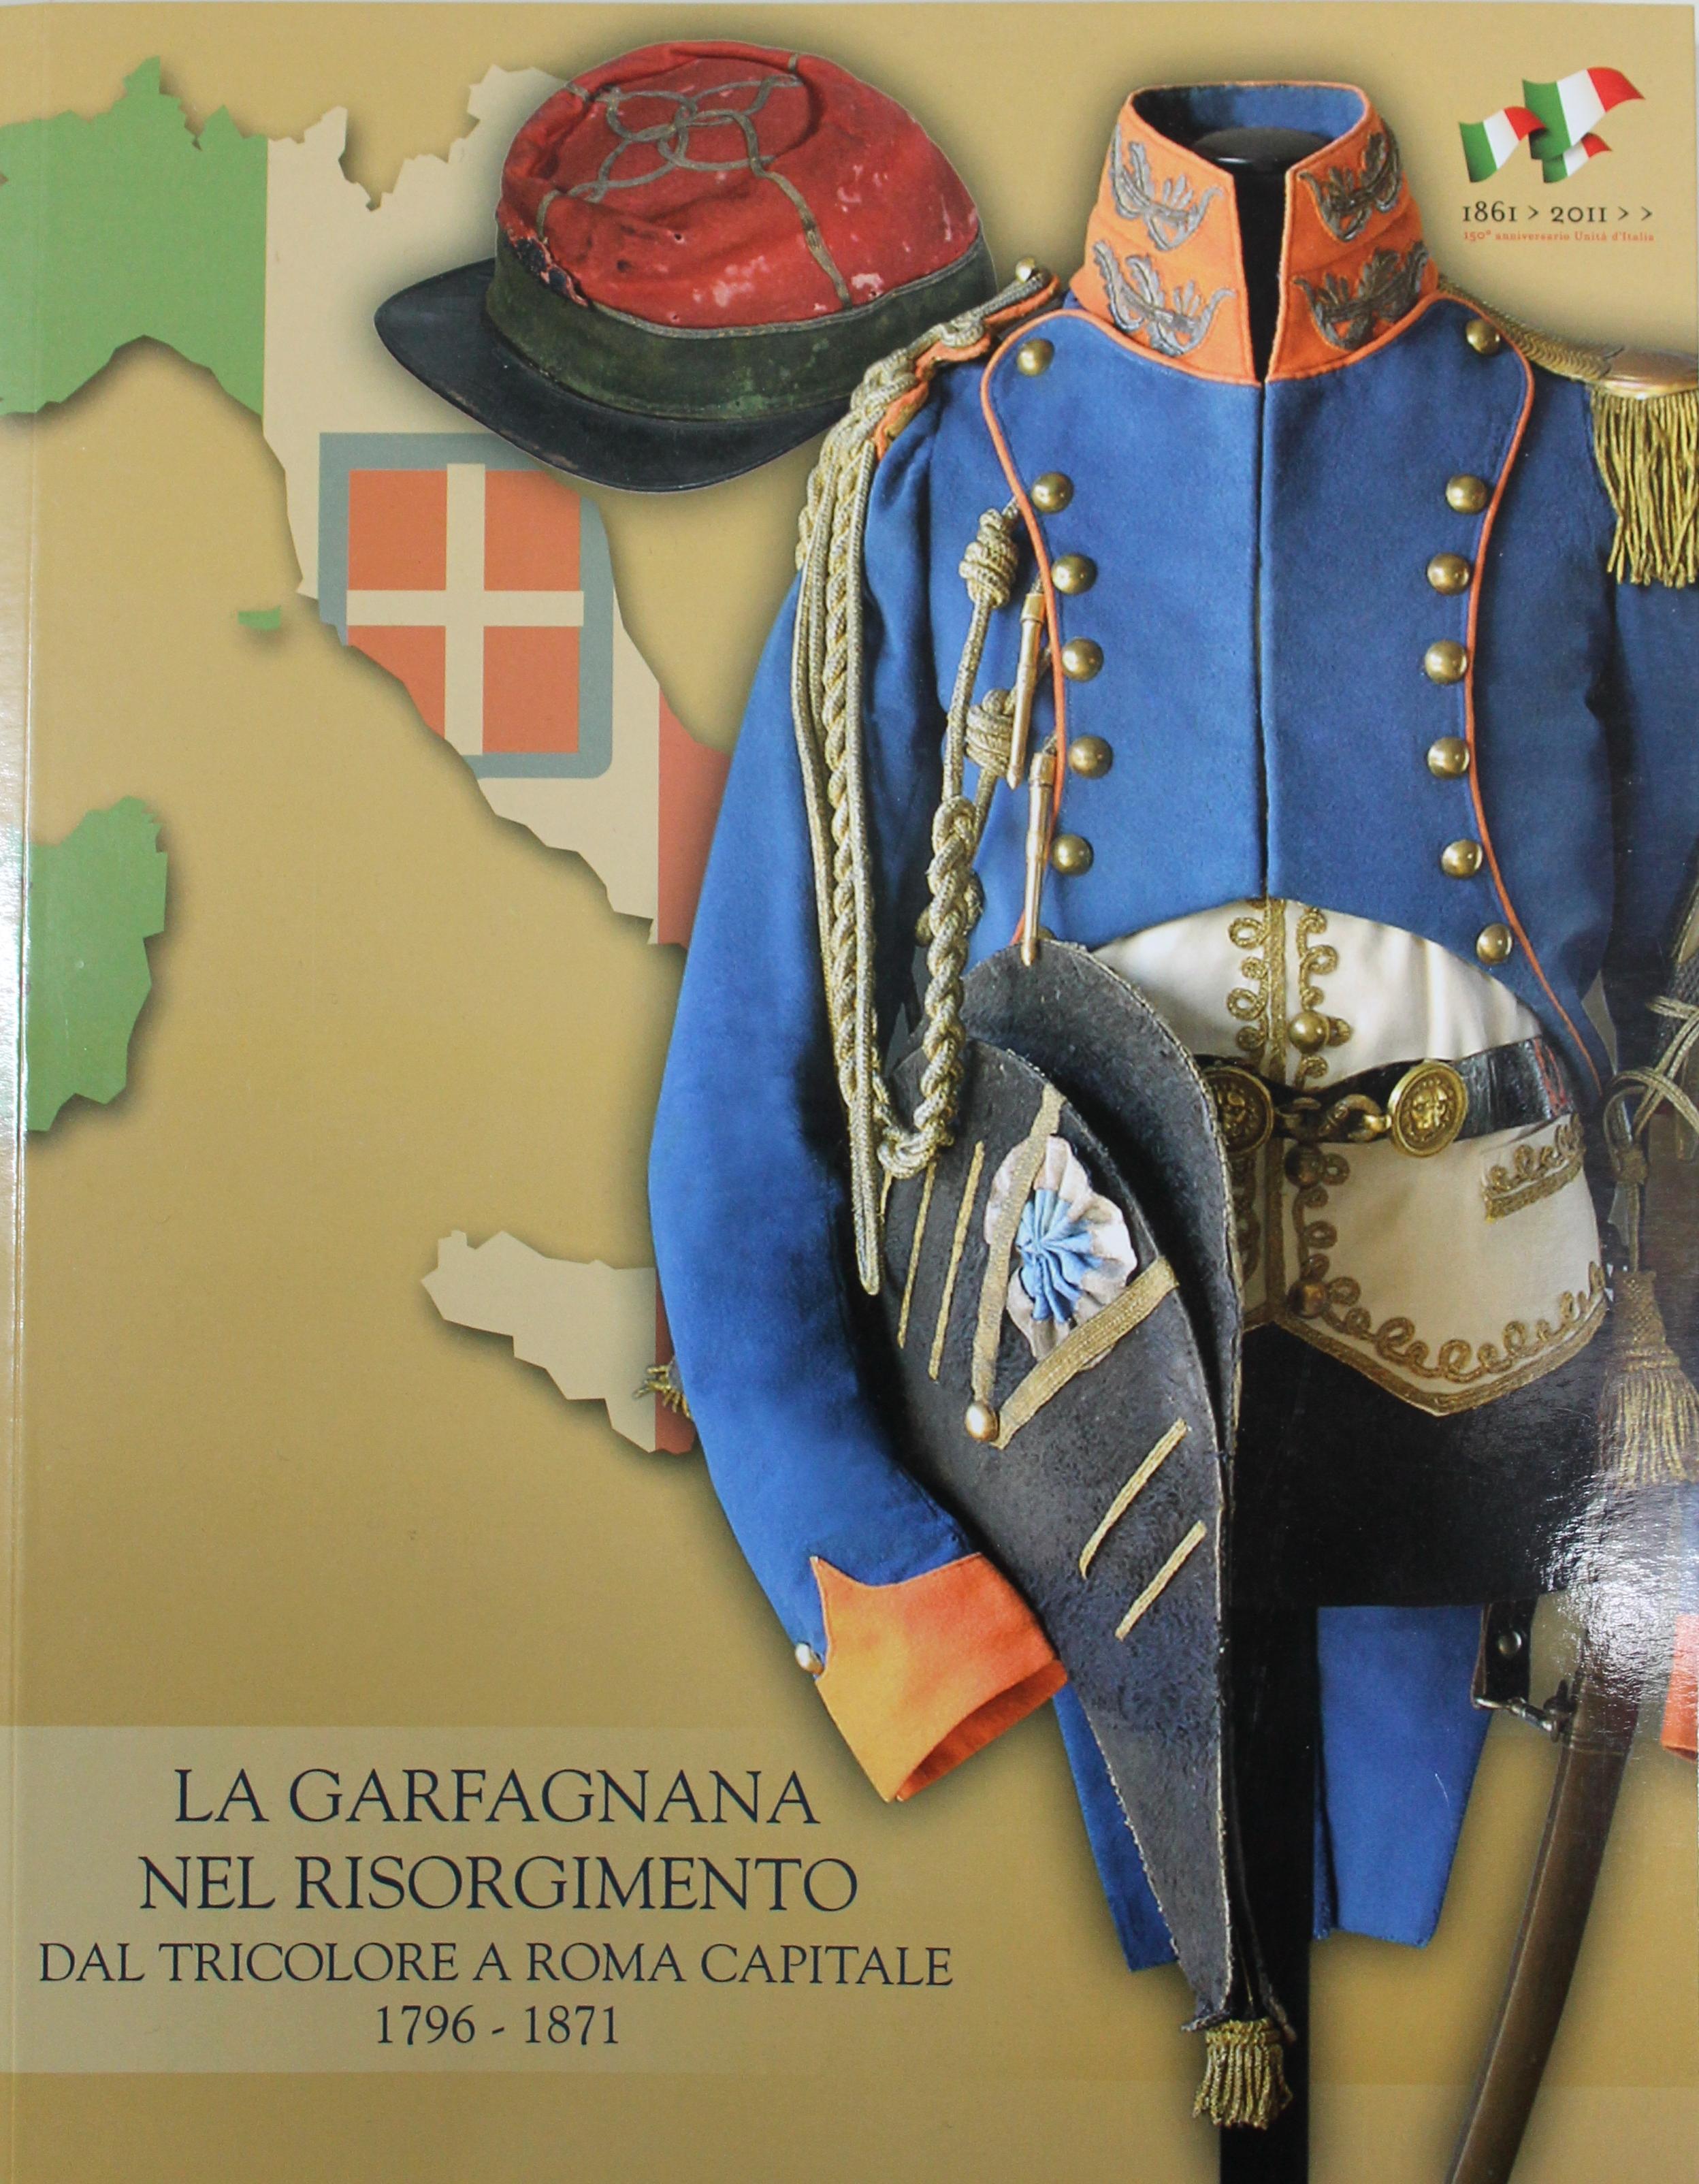 Garfagnana risorgimento 1796-1871